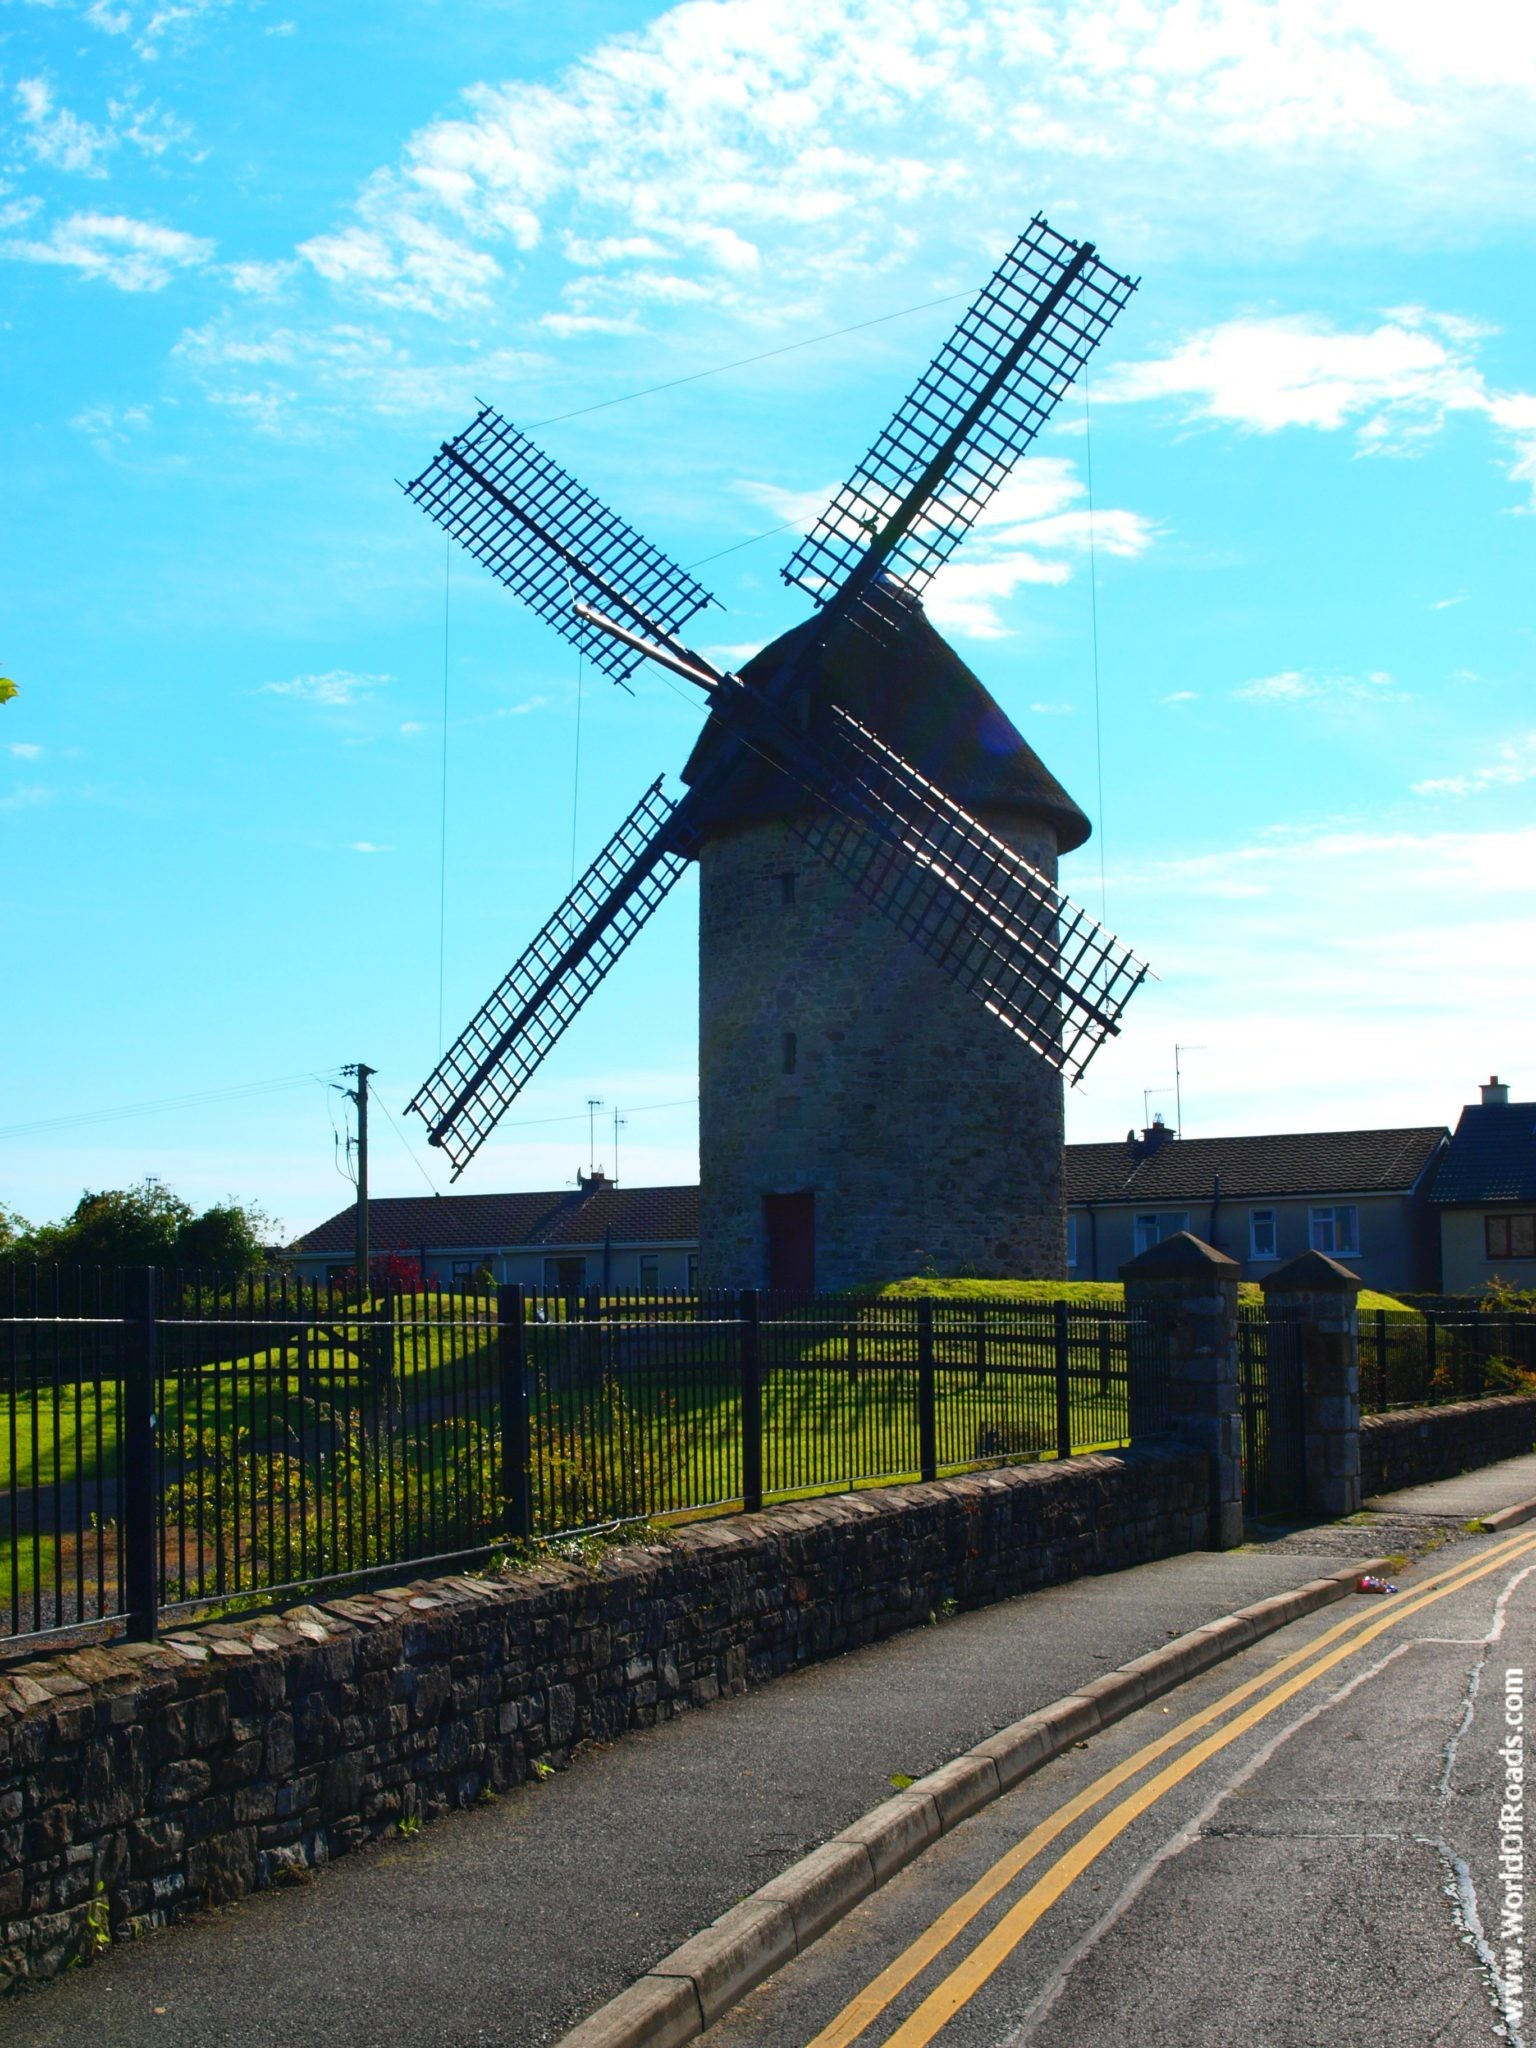 Мельницы Скерриес. (Skerries windmills). Ирландия.